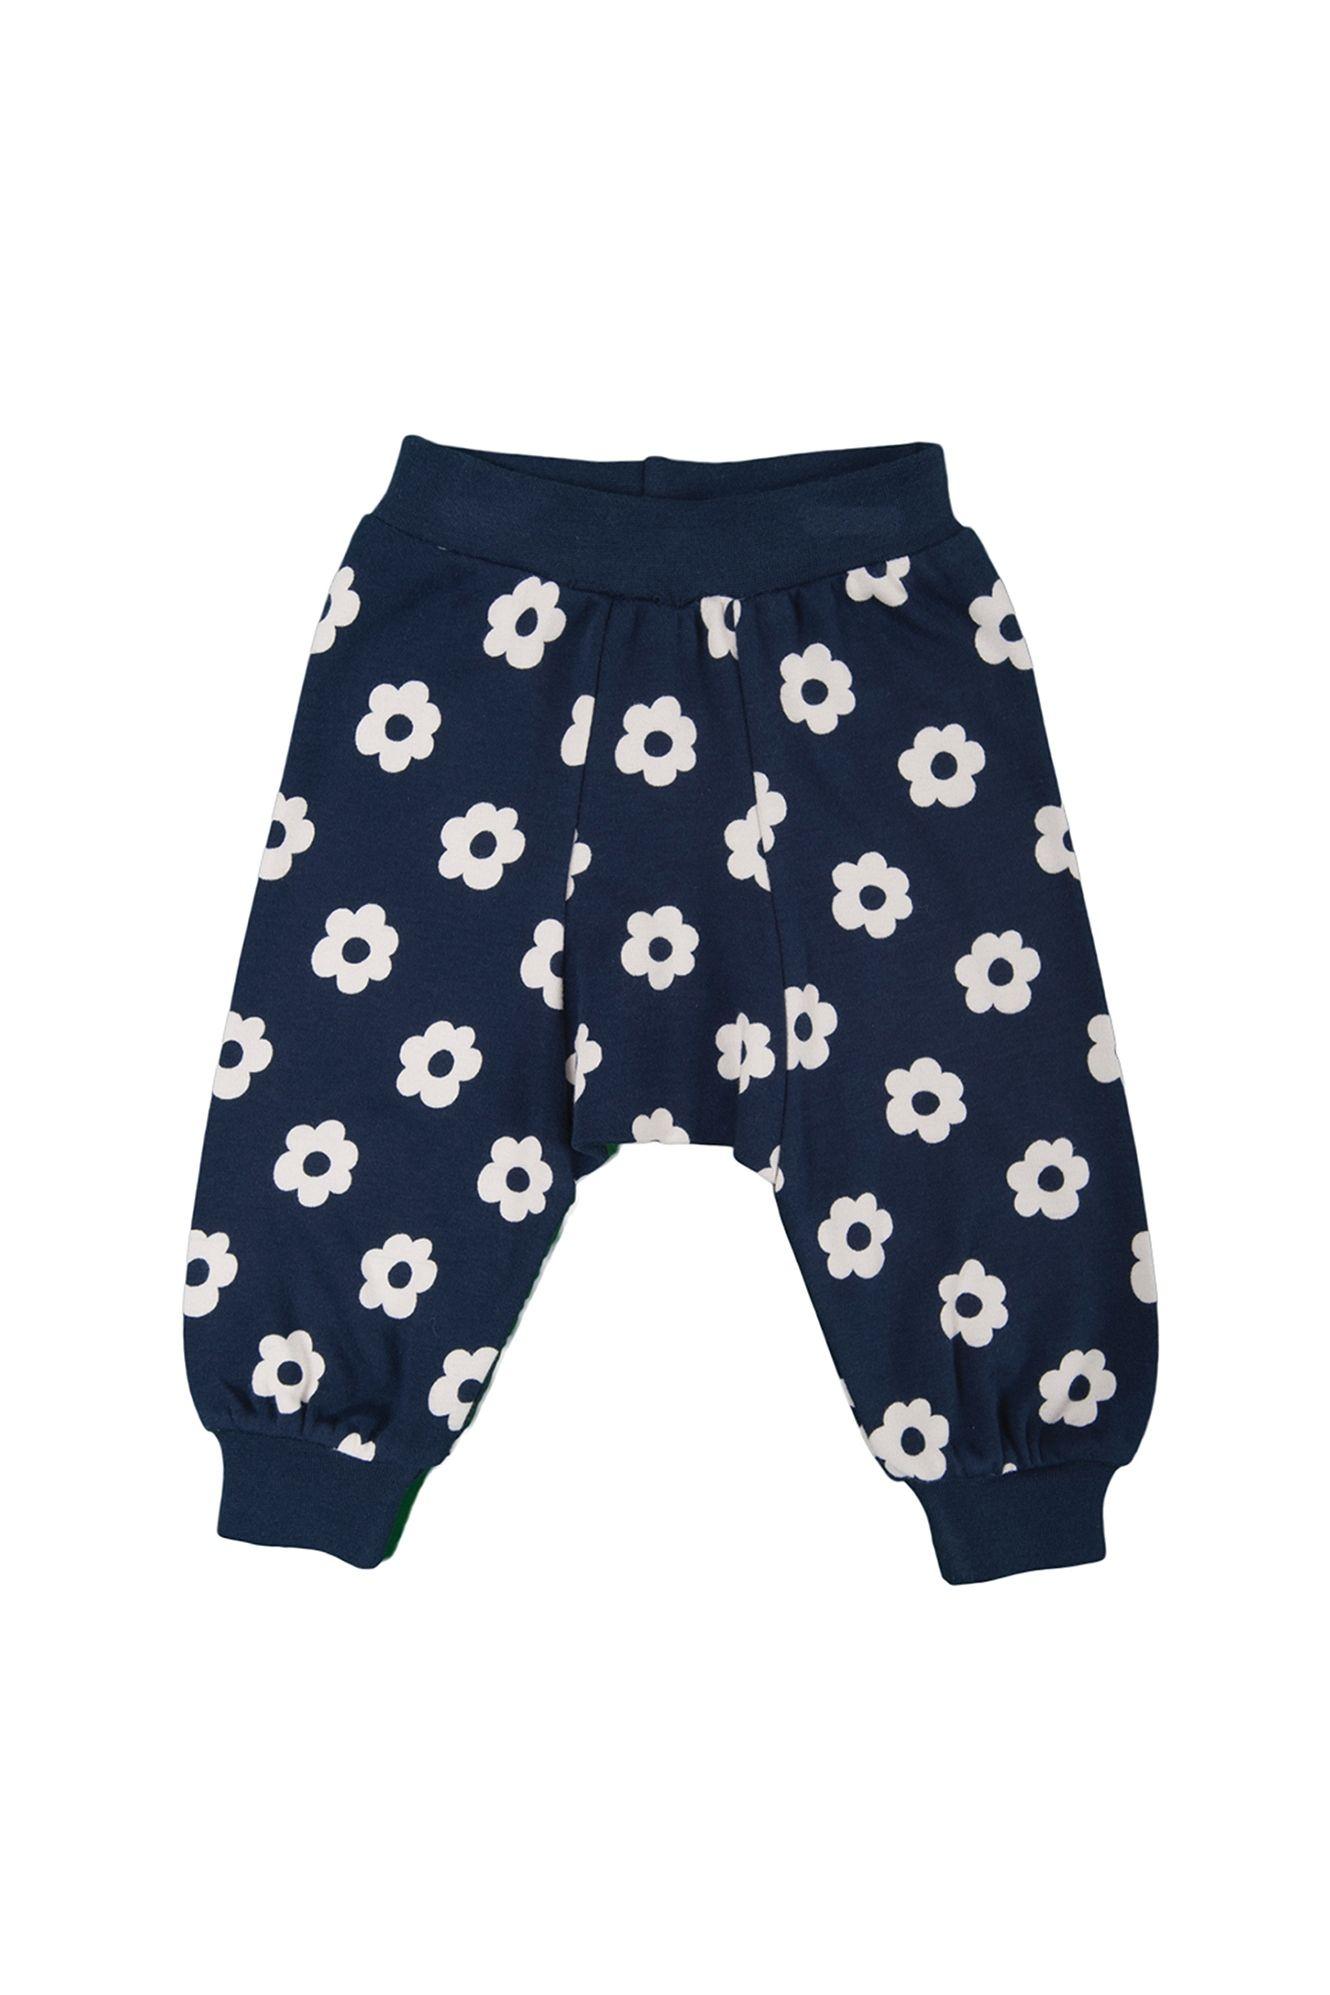 Parsnip Pants Navy Daisy Polka Organic Baby Girl Clothes